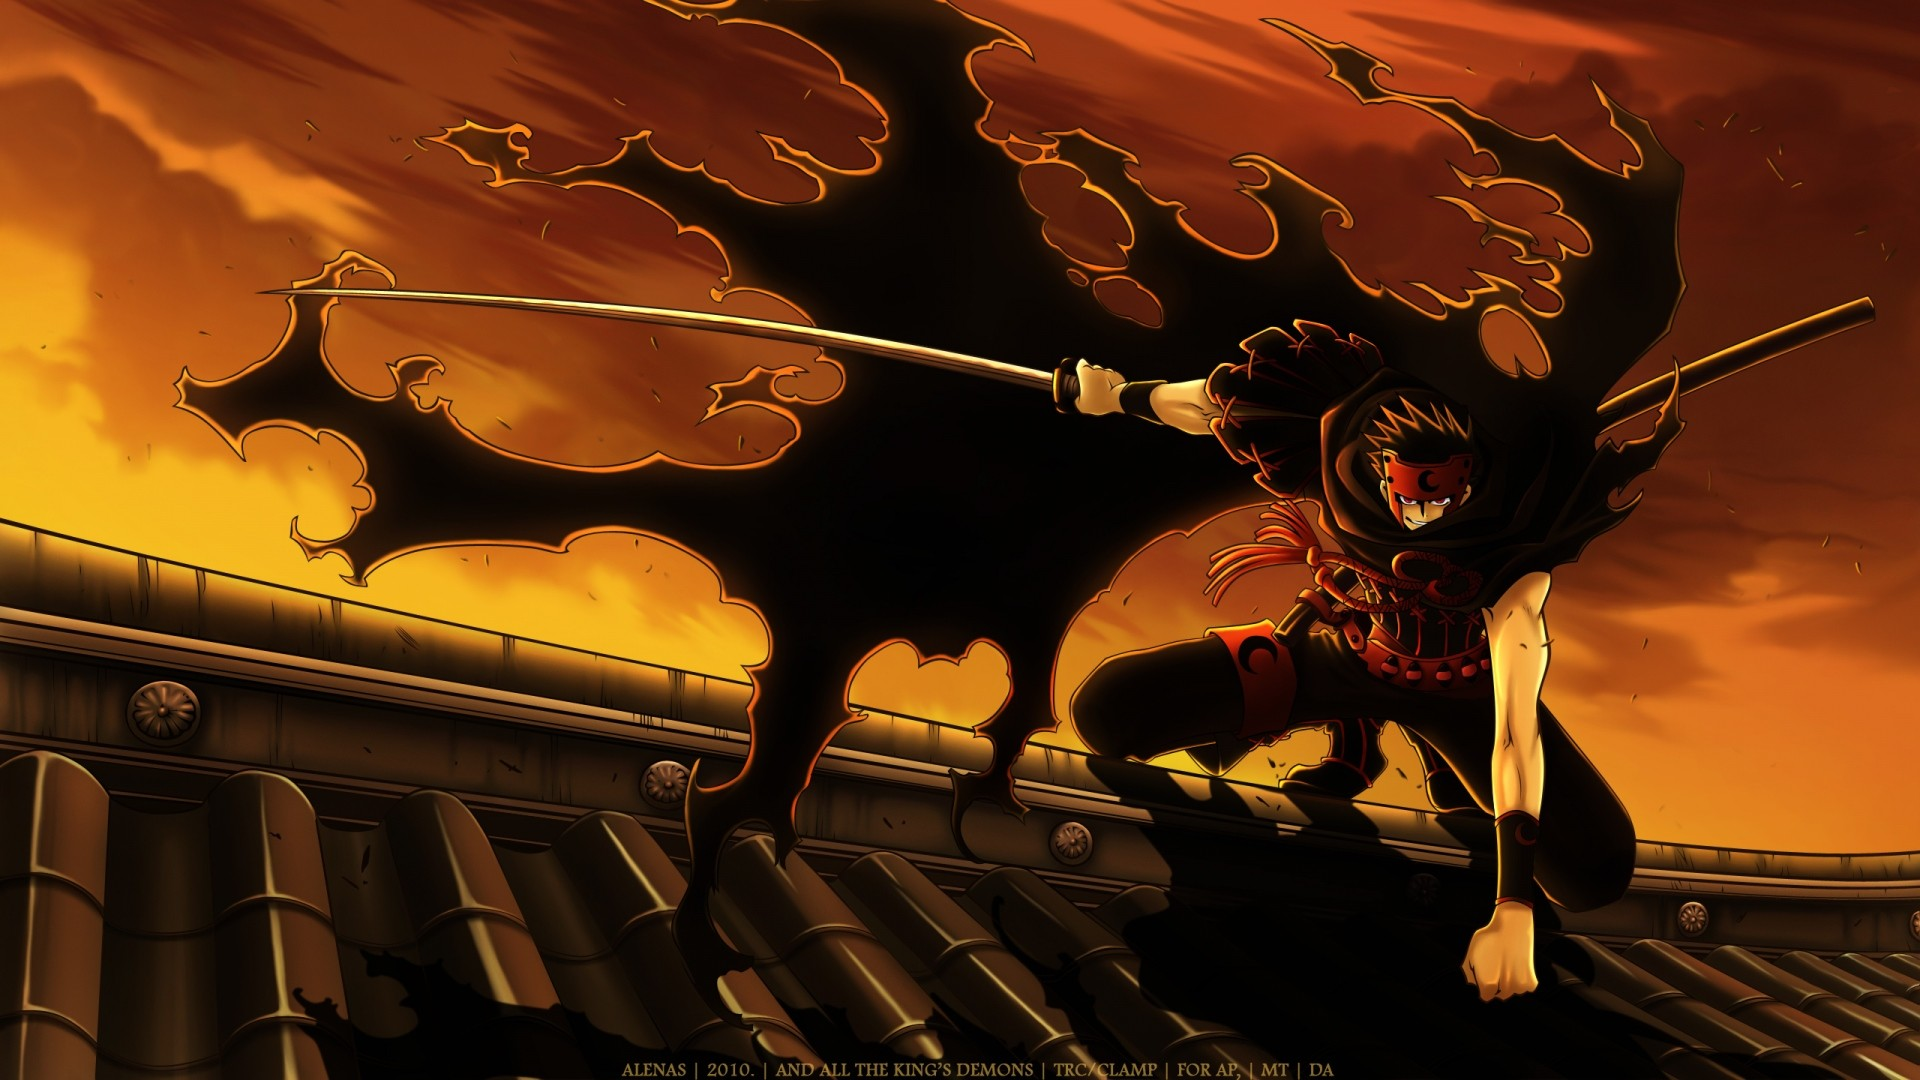 Wallpaper tsubasa reservoir chronicle, kurogane, katana, anime